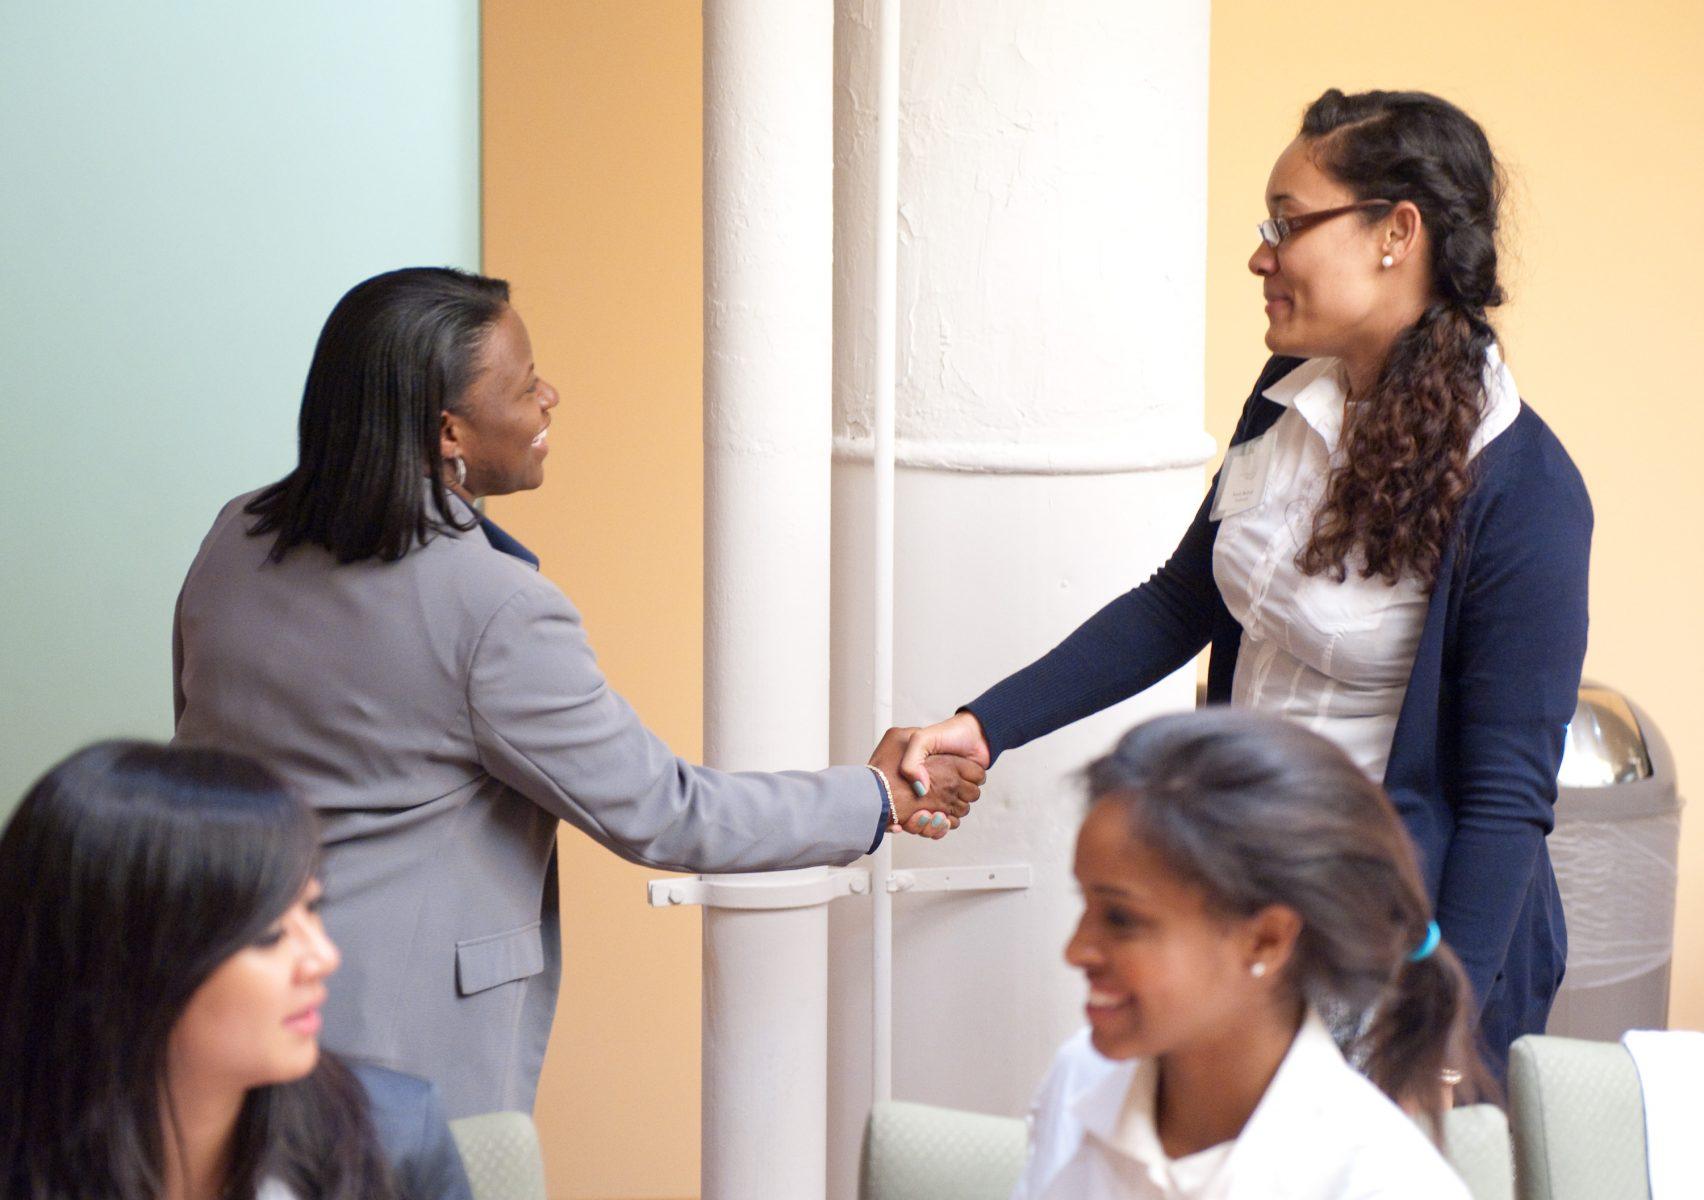 Finding Internships